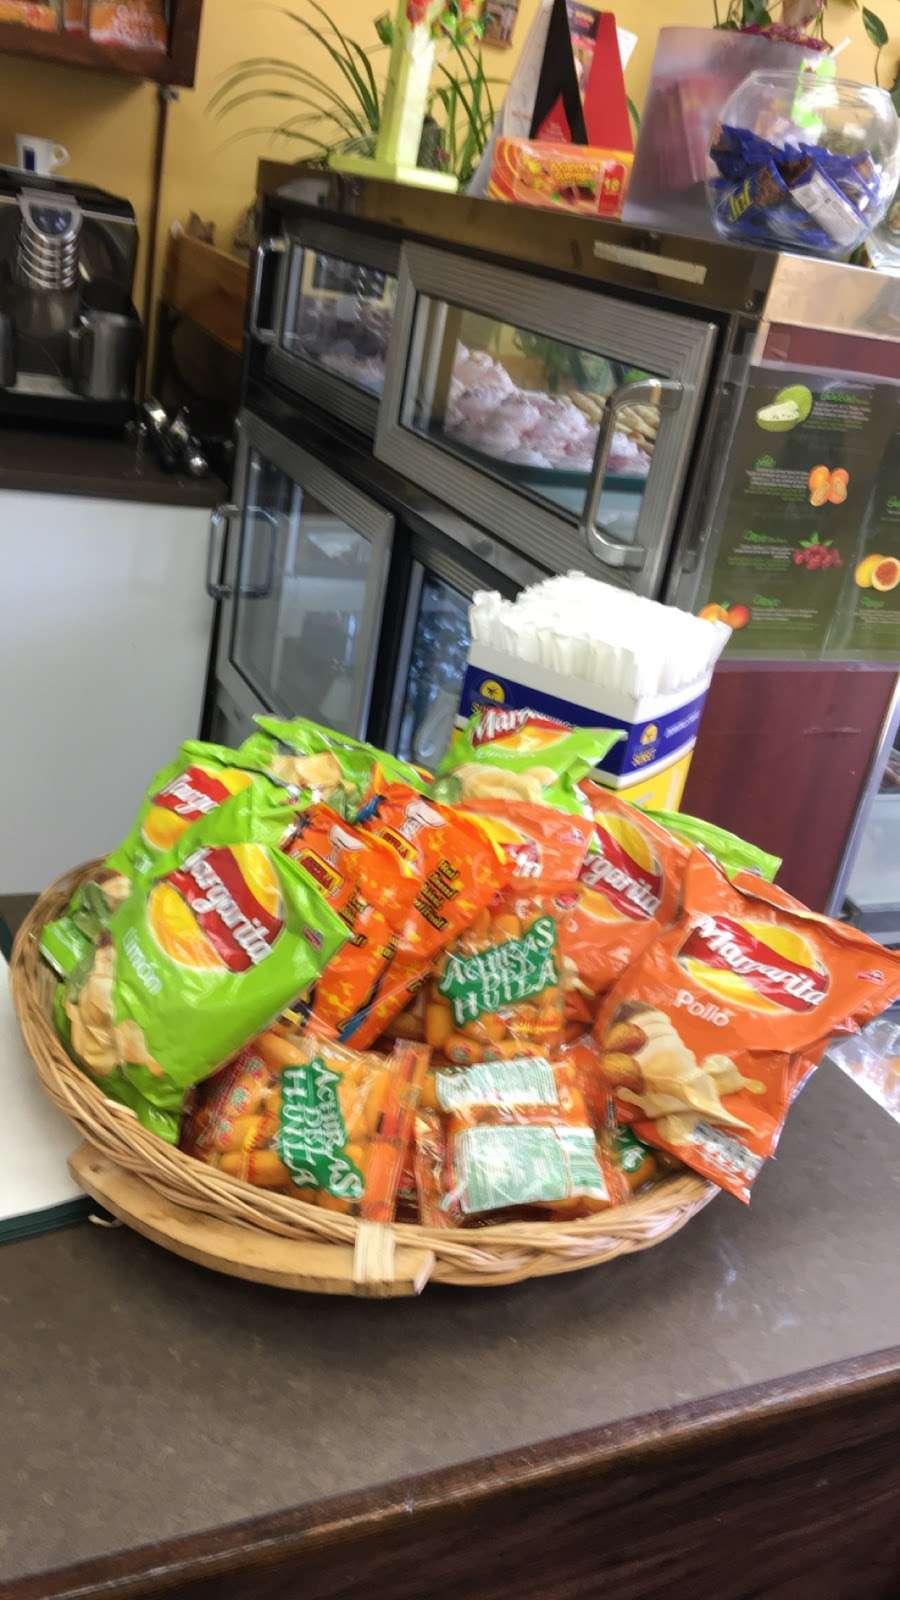 Chiqui Cafe - cafe  | Photo 3 of 7 | Address: 24617 Jericho Turnpike, Queens, NY 11426, USA | Phone: (718) 347-8100